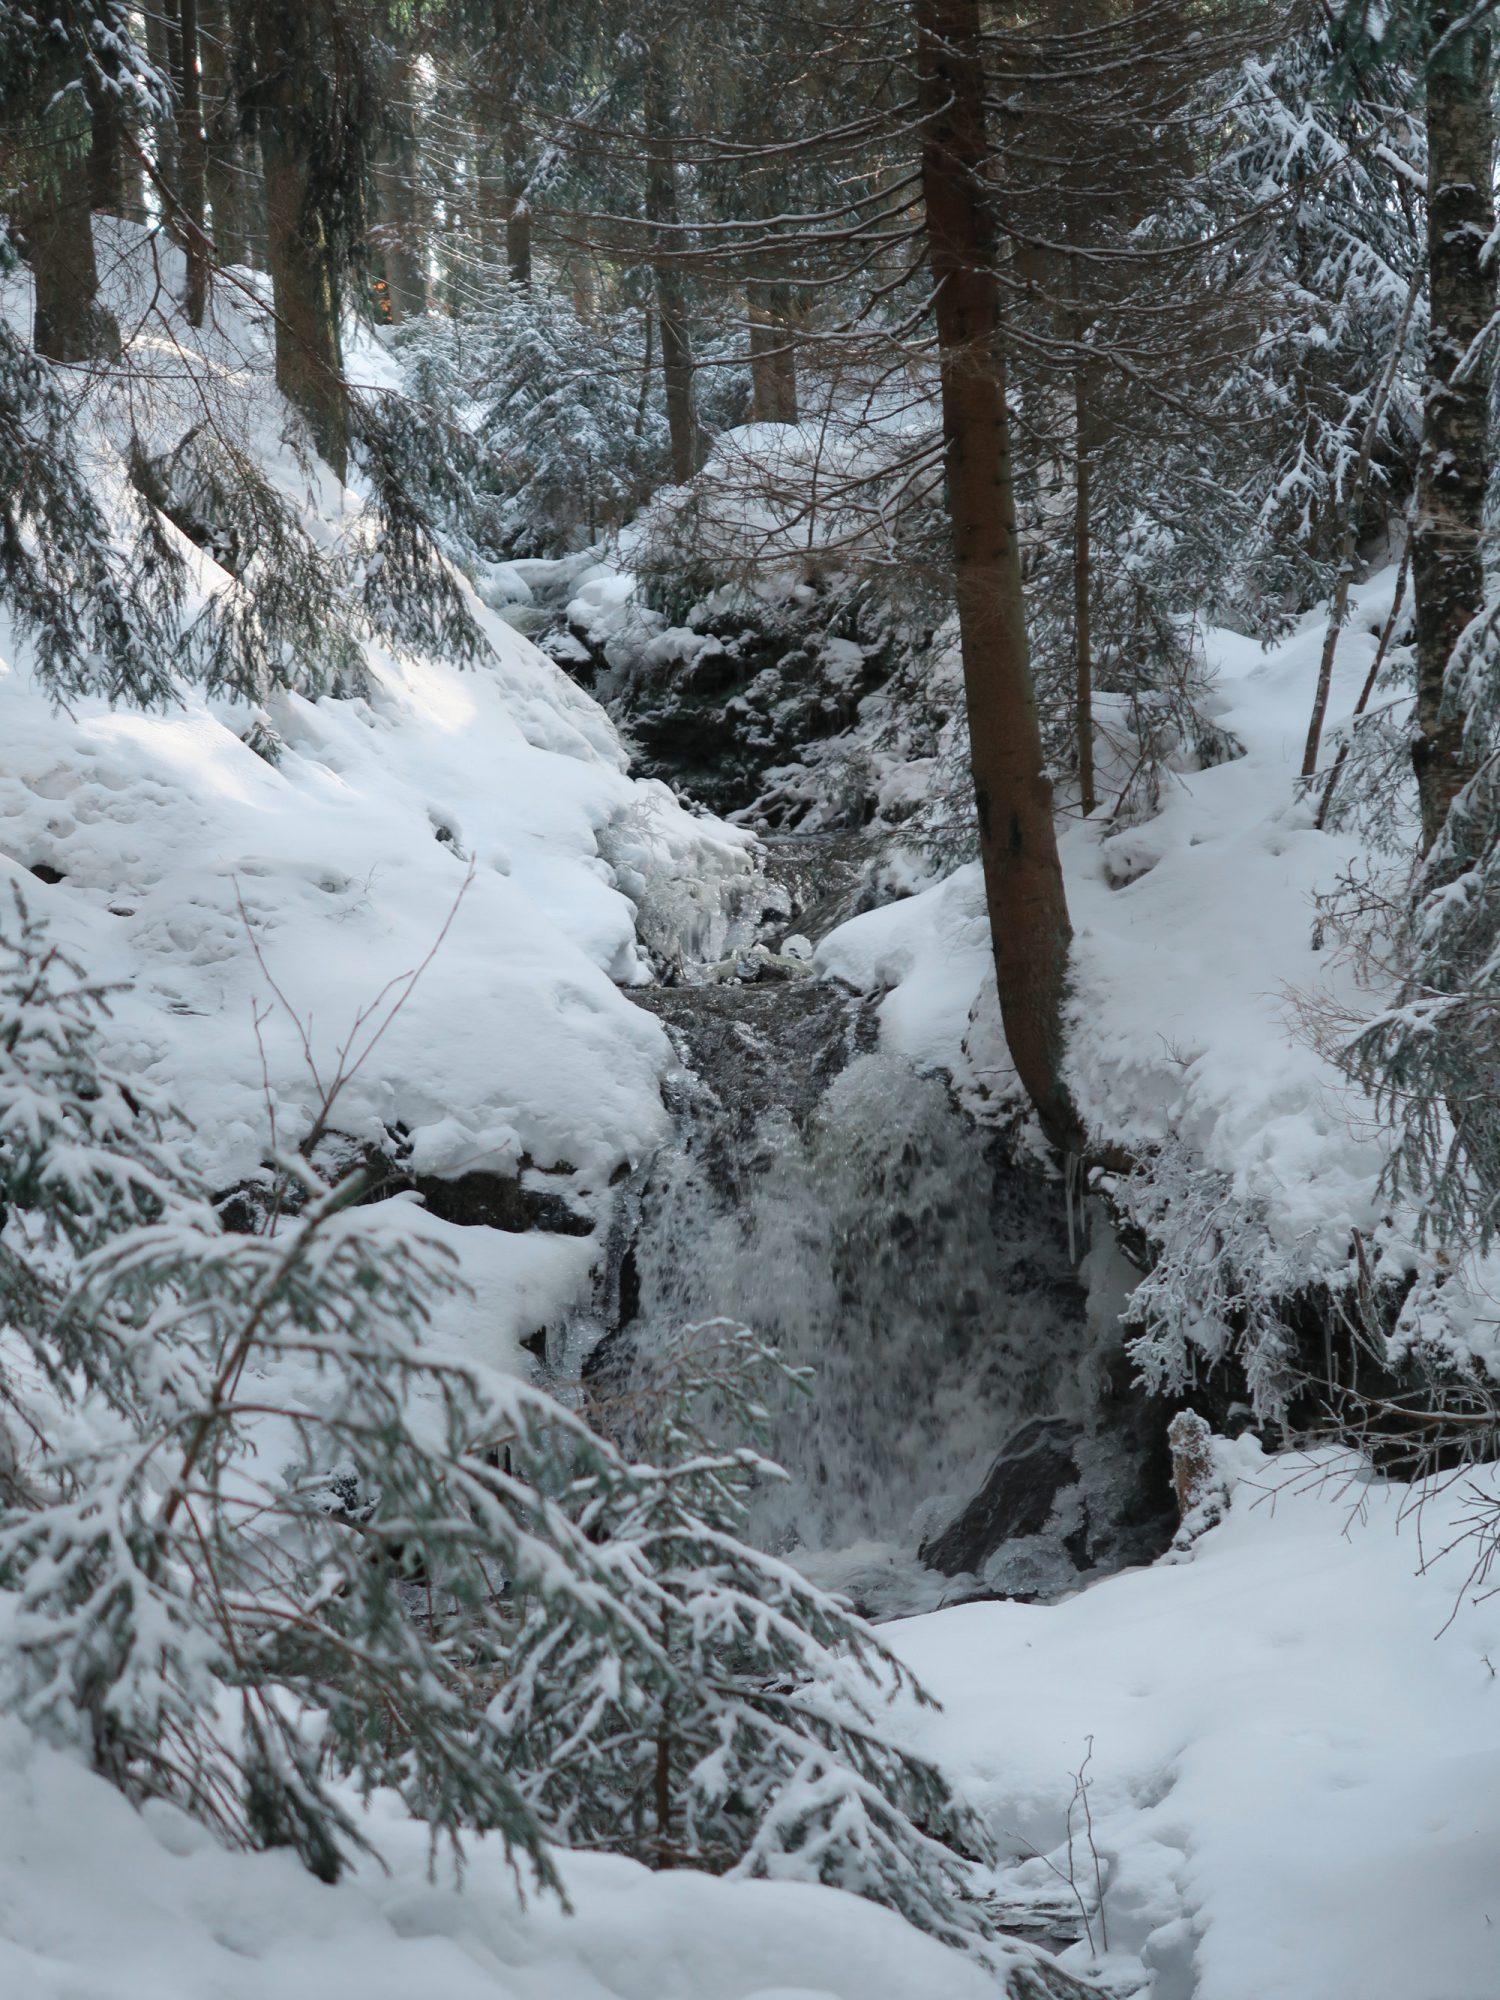 Rißbachfälle, Winterwandern im Vogtland, Felsenweg, Grünbach;